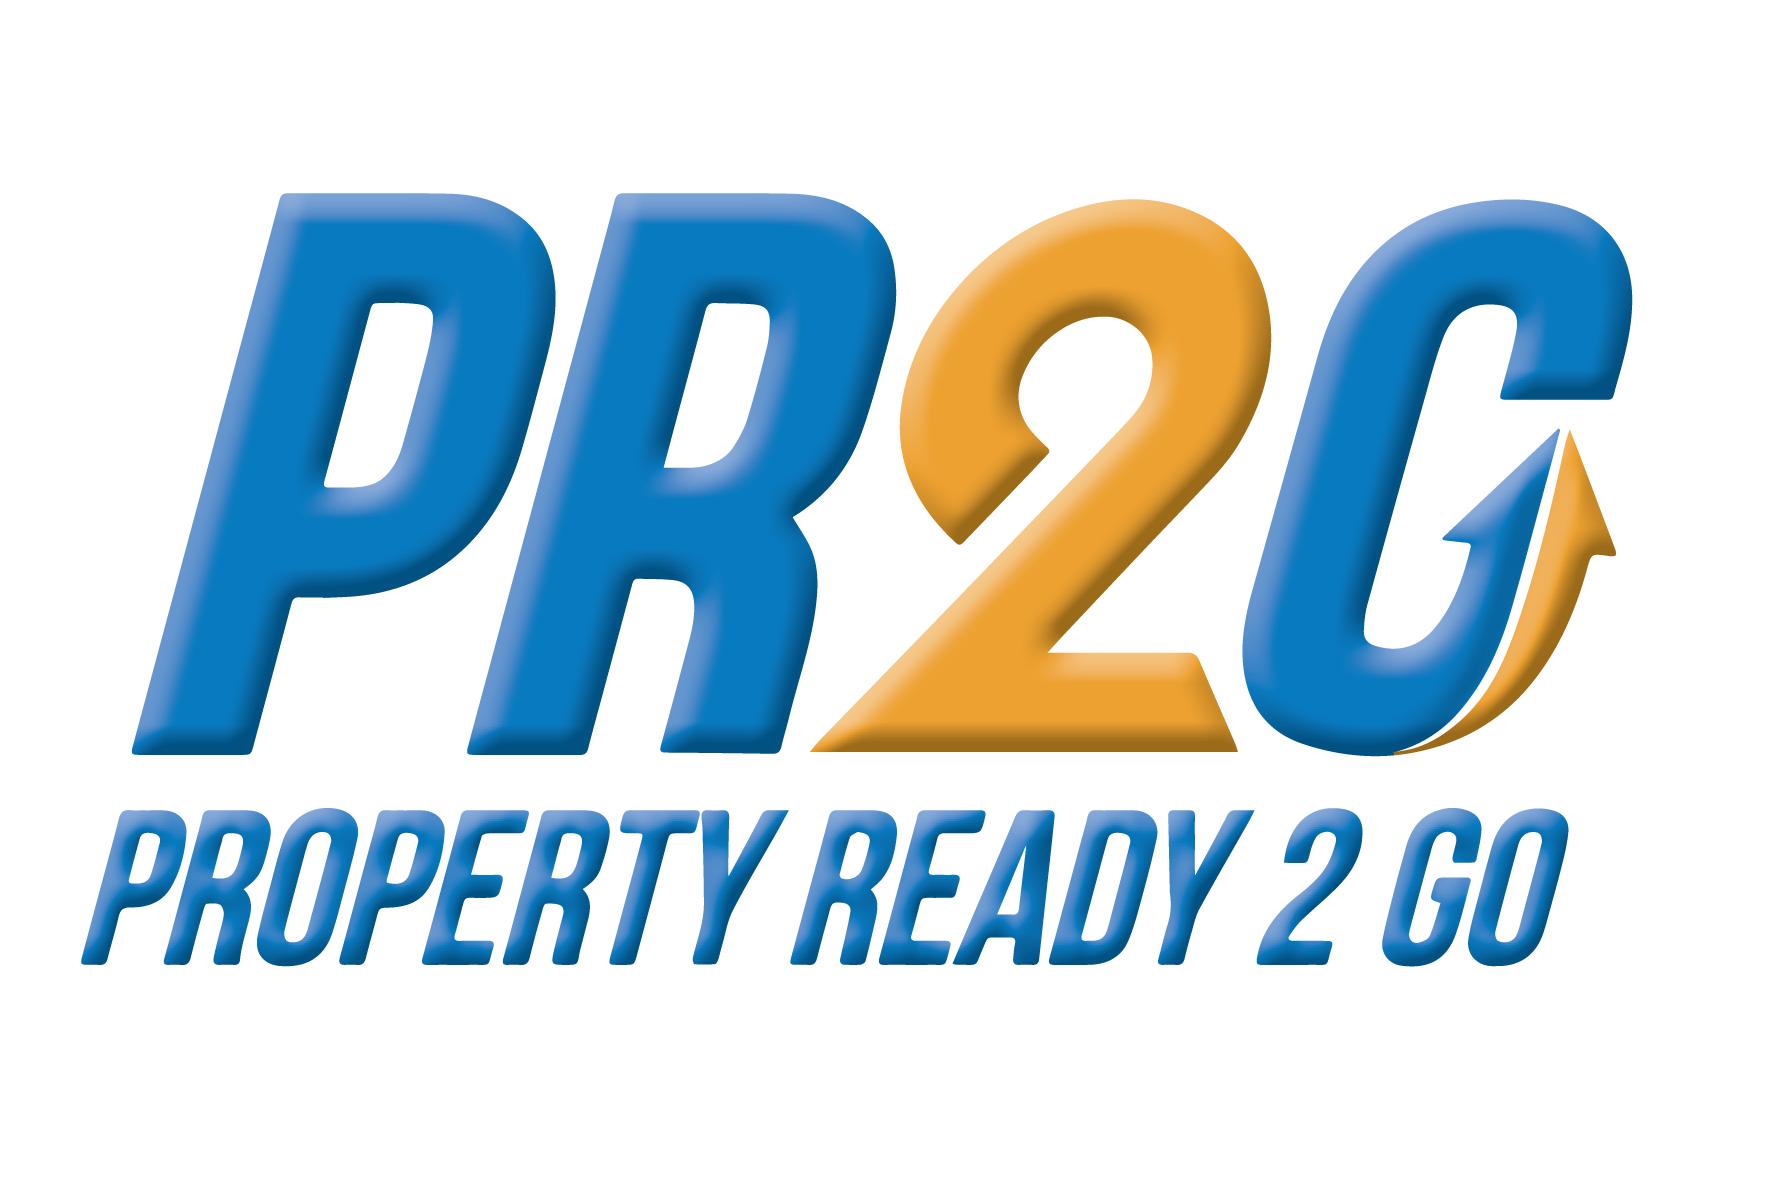 Property Ready 2 Go  logo